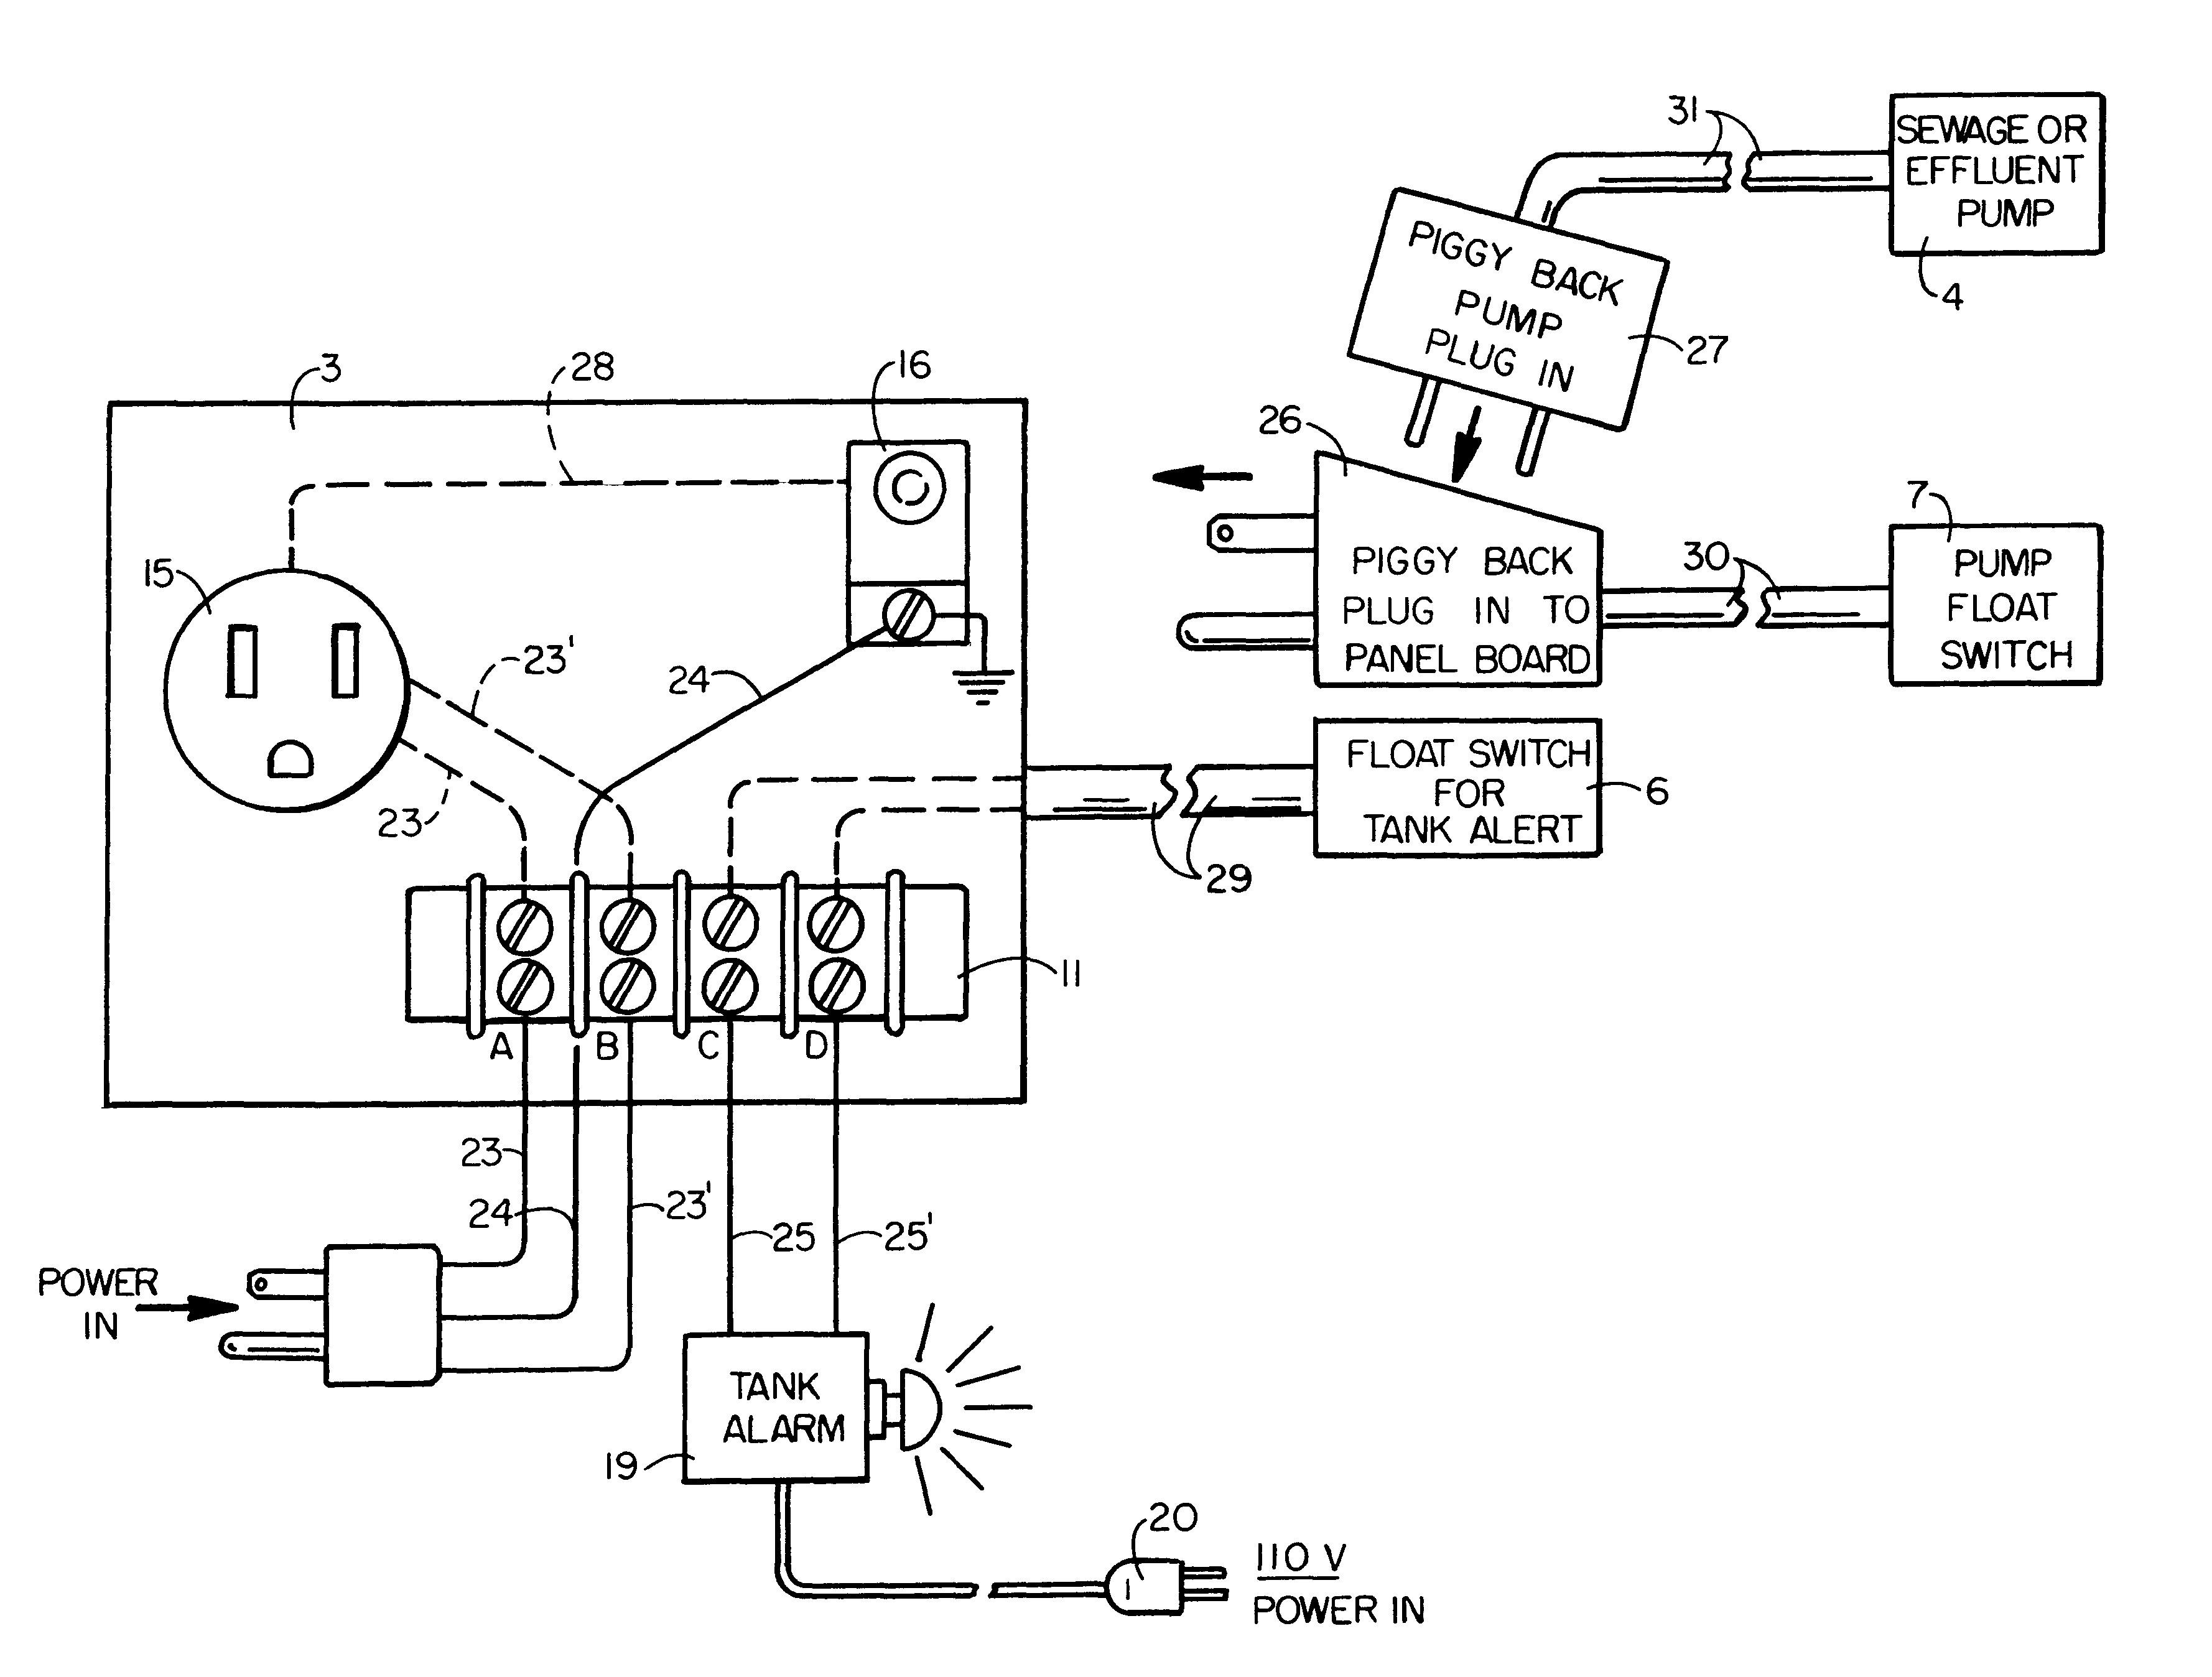 Septic Pump Wiring Diagram Septic Tank Pump Alarm 75 with Septic Tank Pump Alarm Cm Bbs Of Septic Pump Wiring Diagram